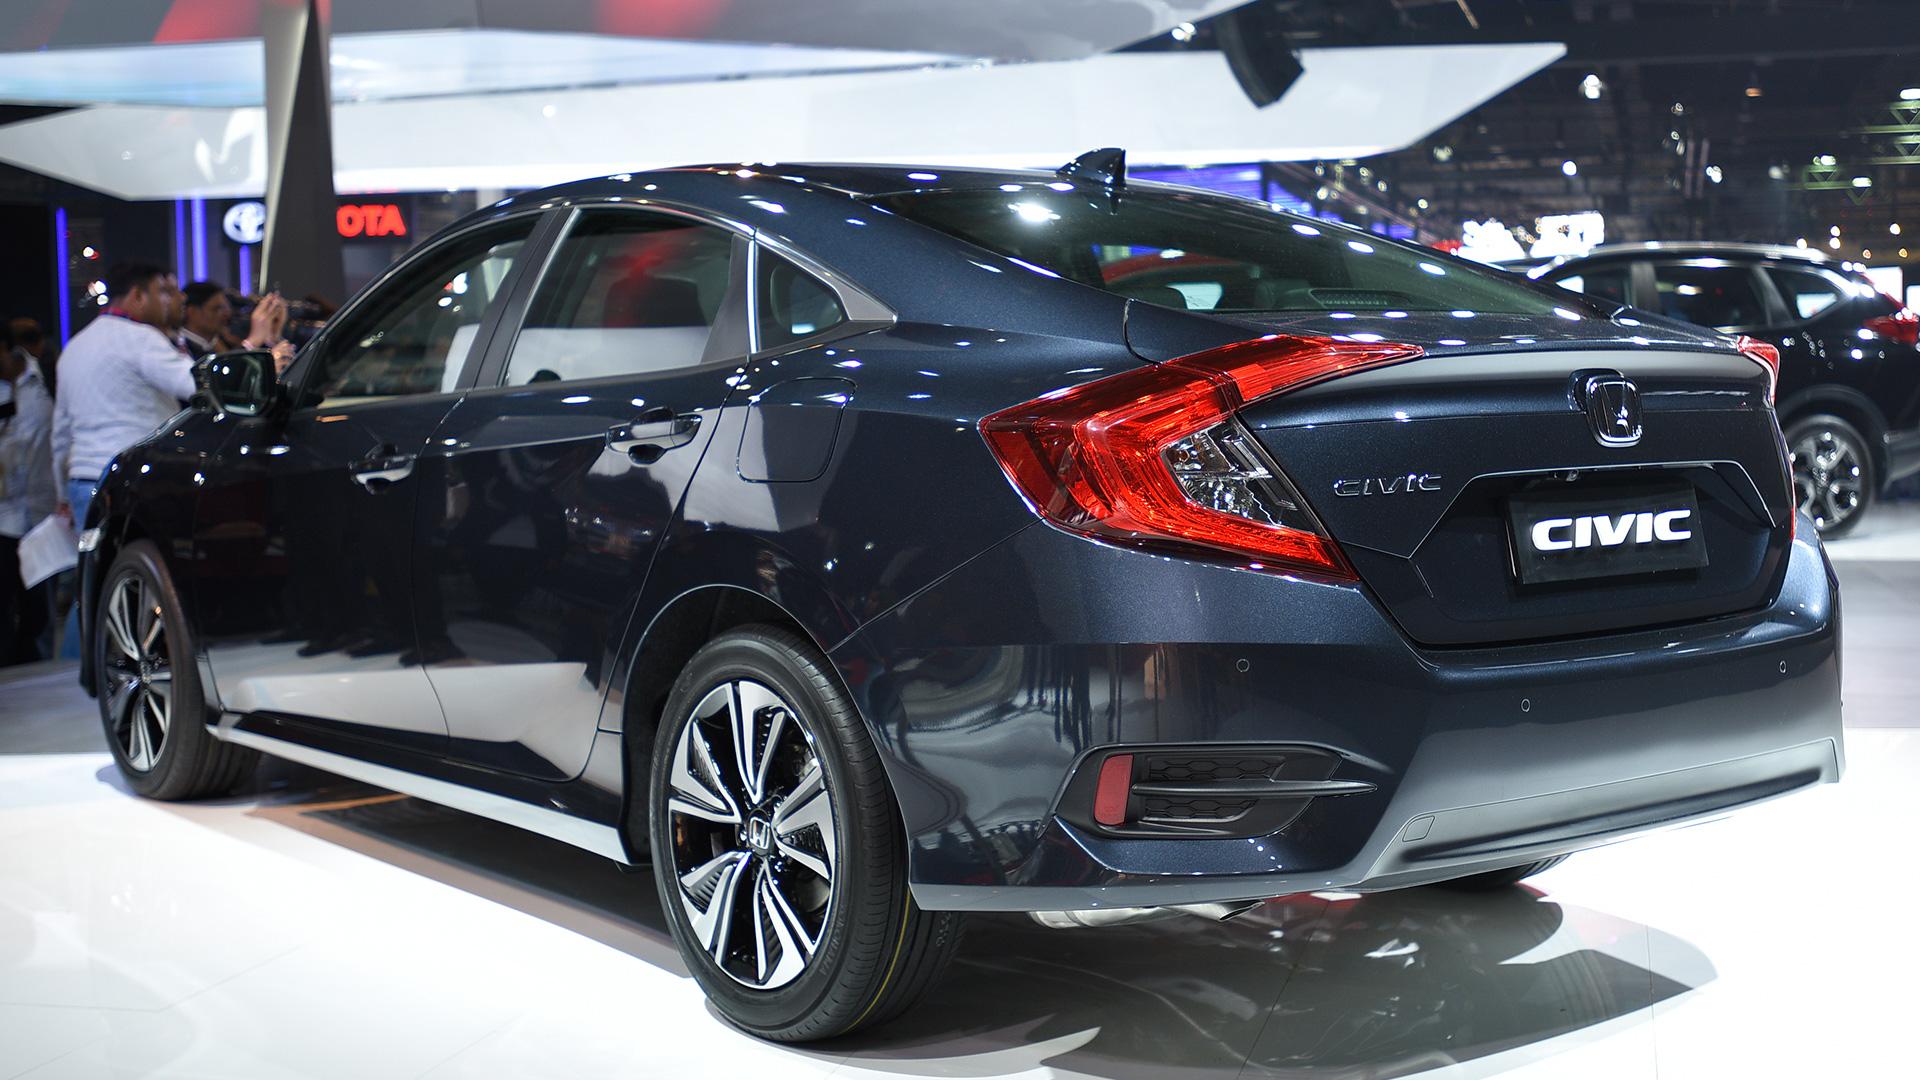 Honda Civic Tourer 2018 >> Honda Civic 2018 STD Exterior Car Photos - Overdrive